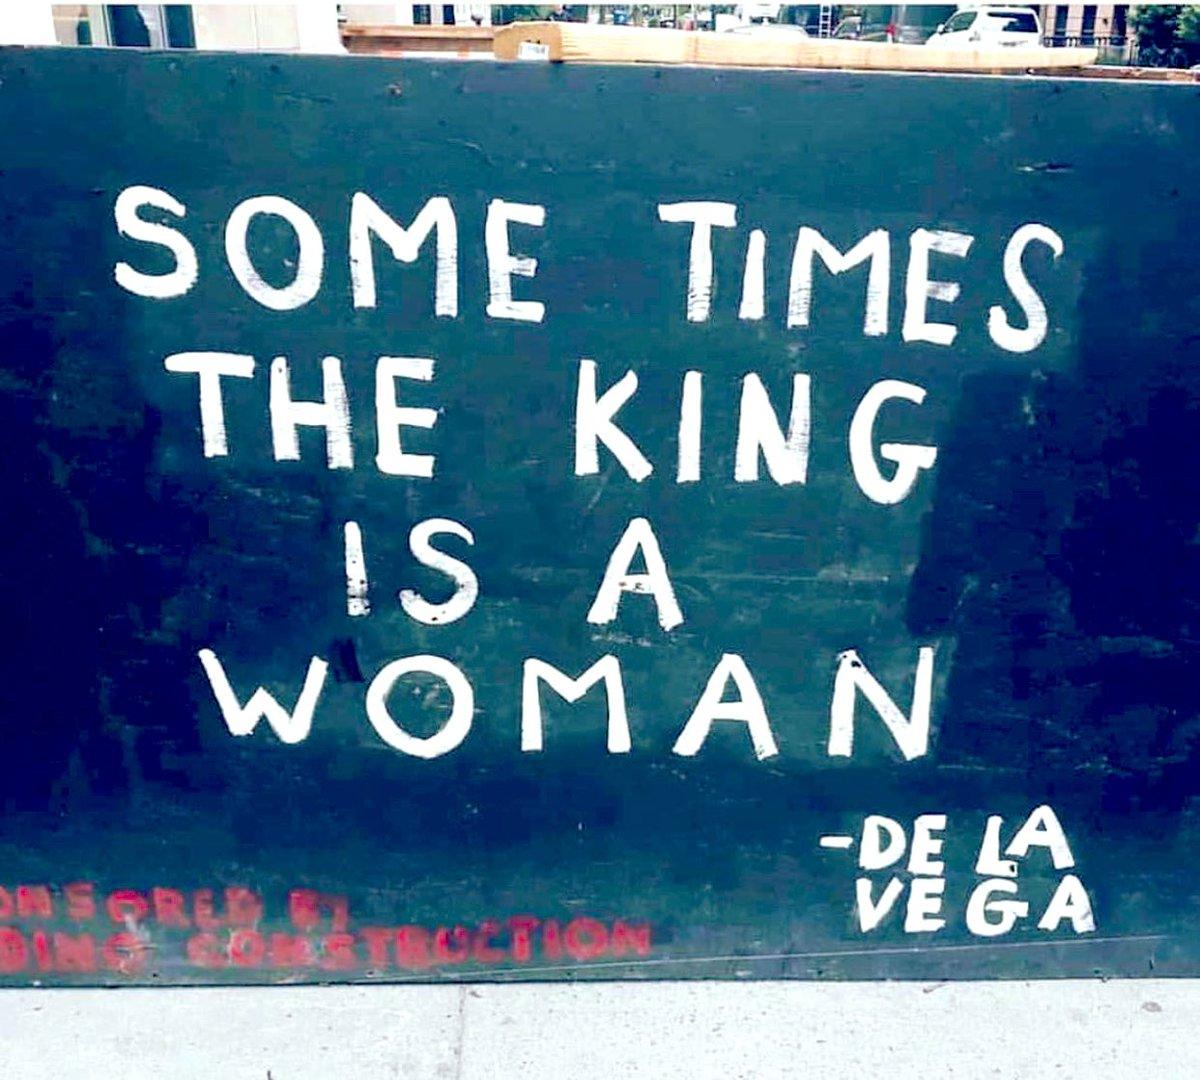 Be A King (@BerniceKing) on Twitter photo 09/08/2020 12:27:55